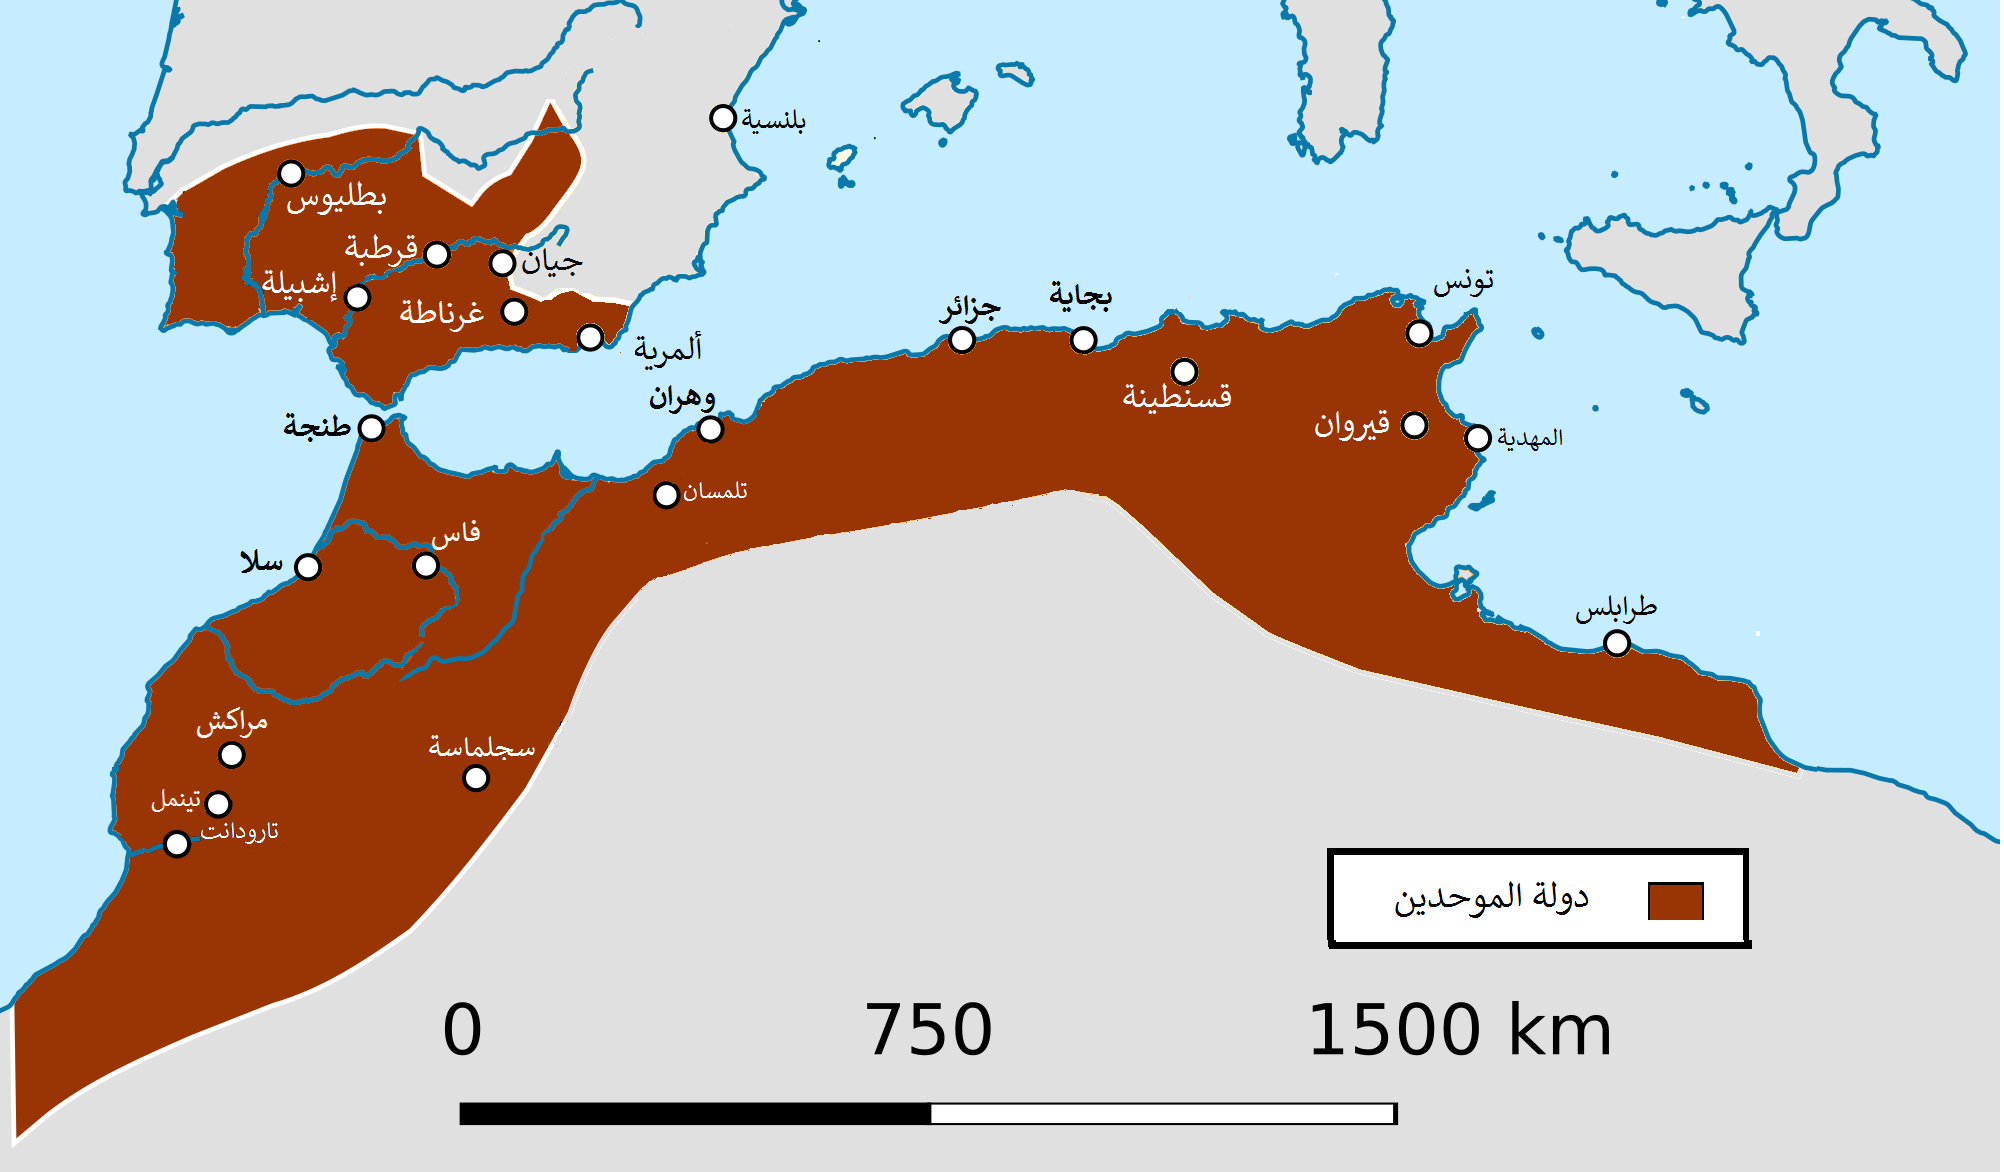 1152-1159